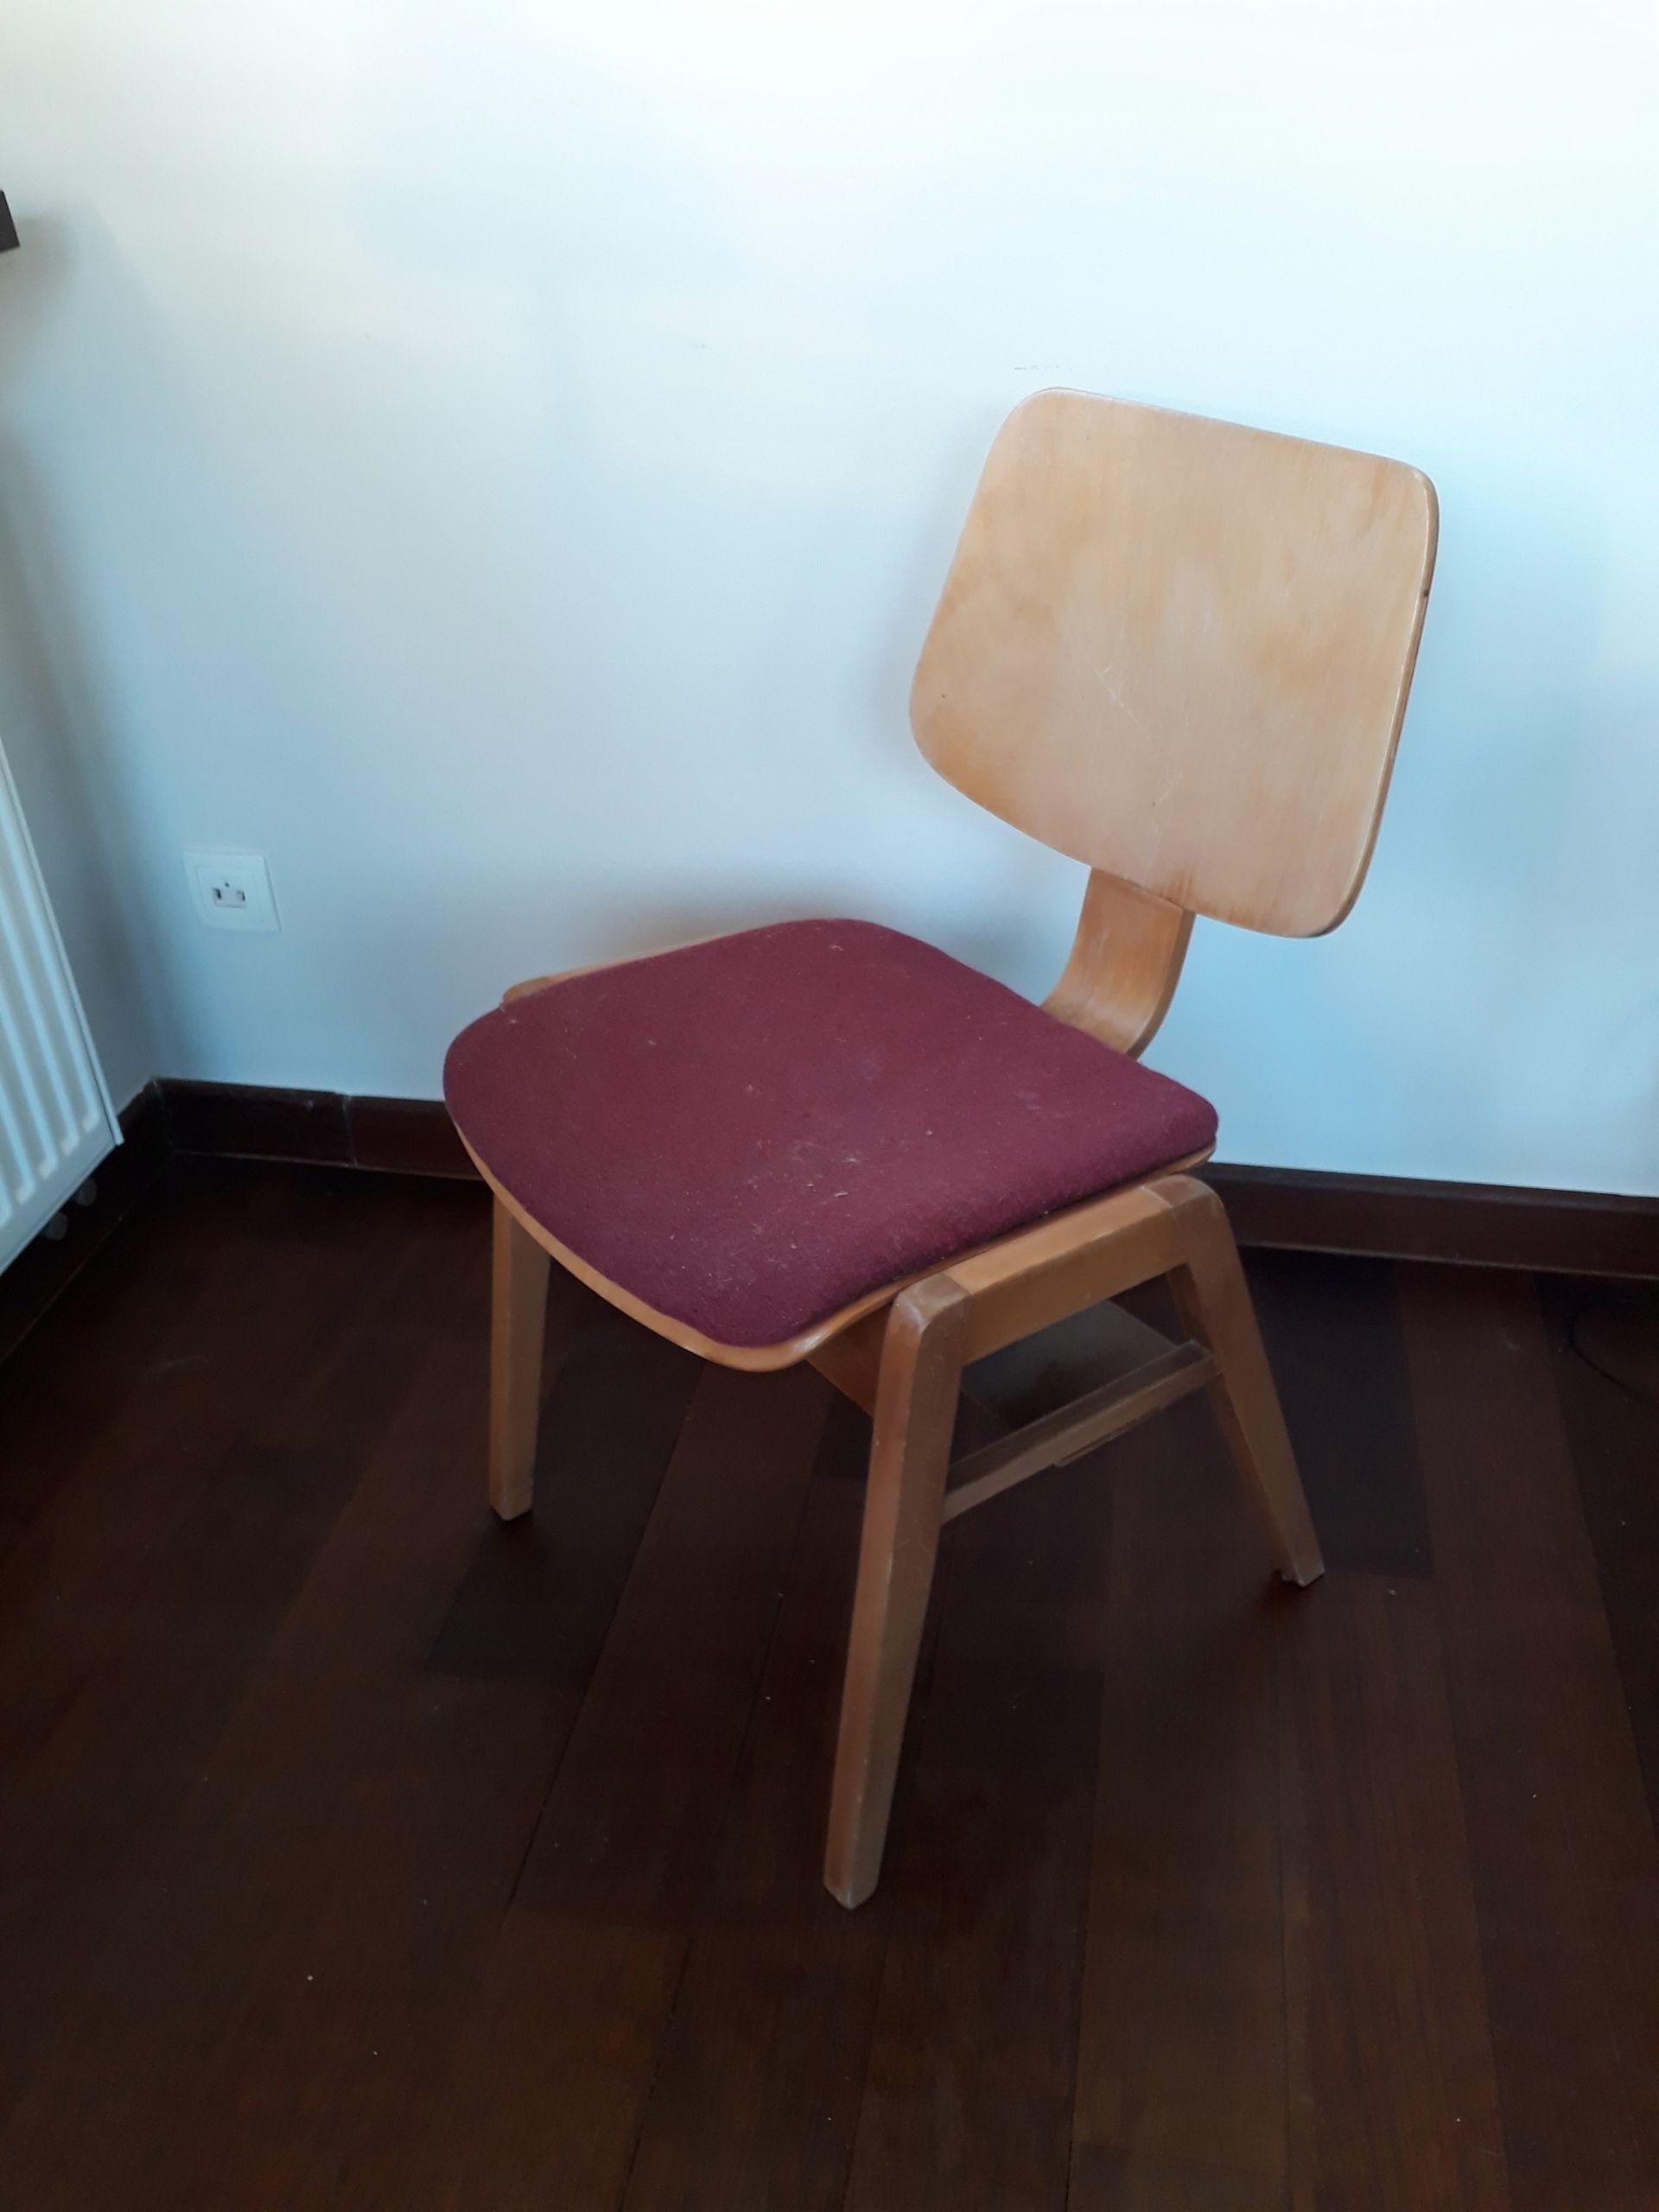 Krzeslo Retro Prl 8265005489 Oficjalne Archiwum Allegro Dining Chairs Chair Decor